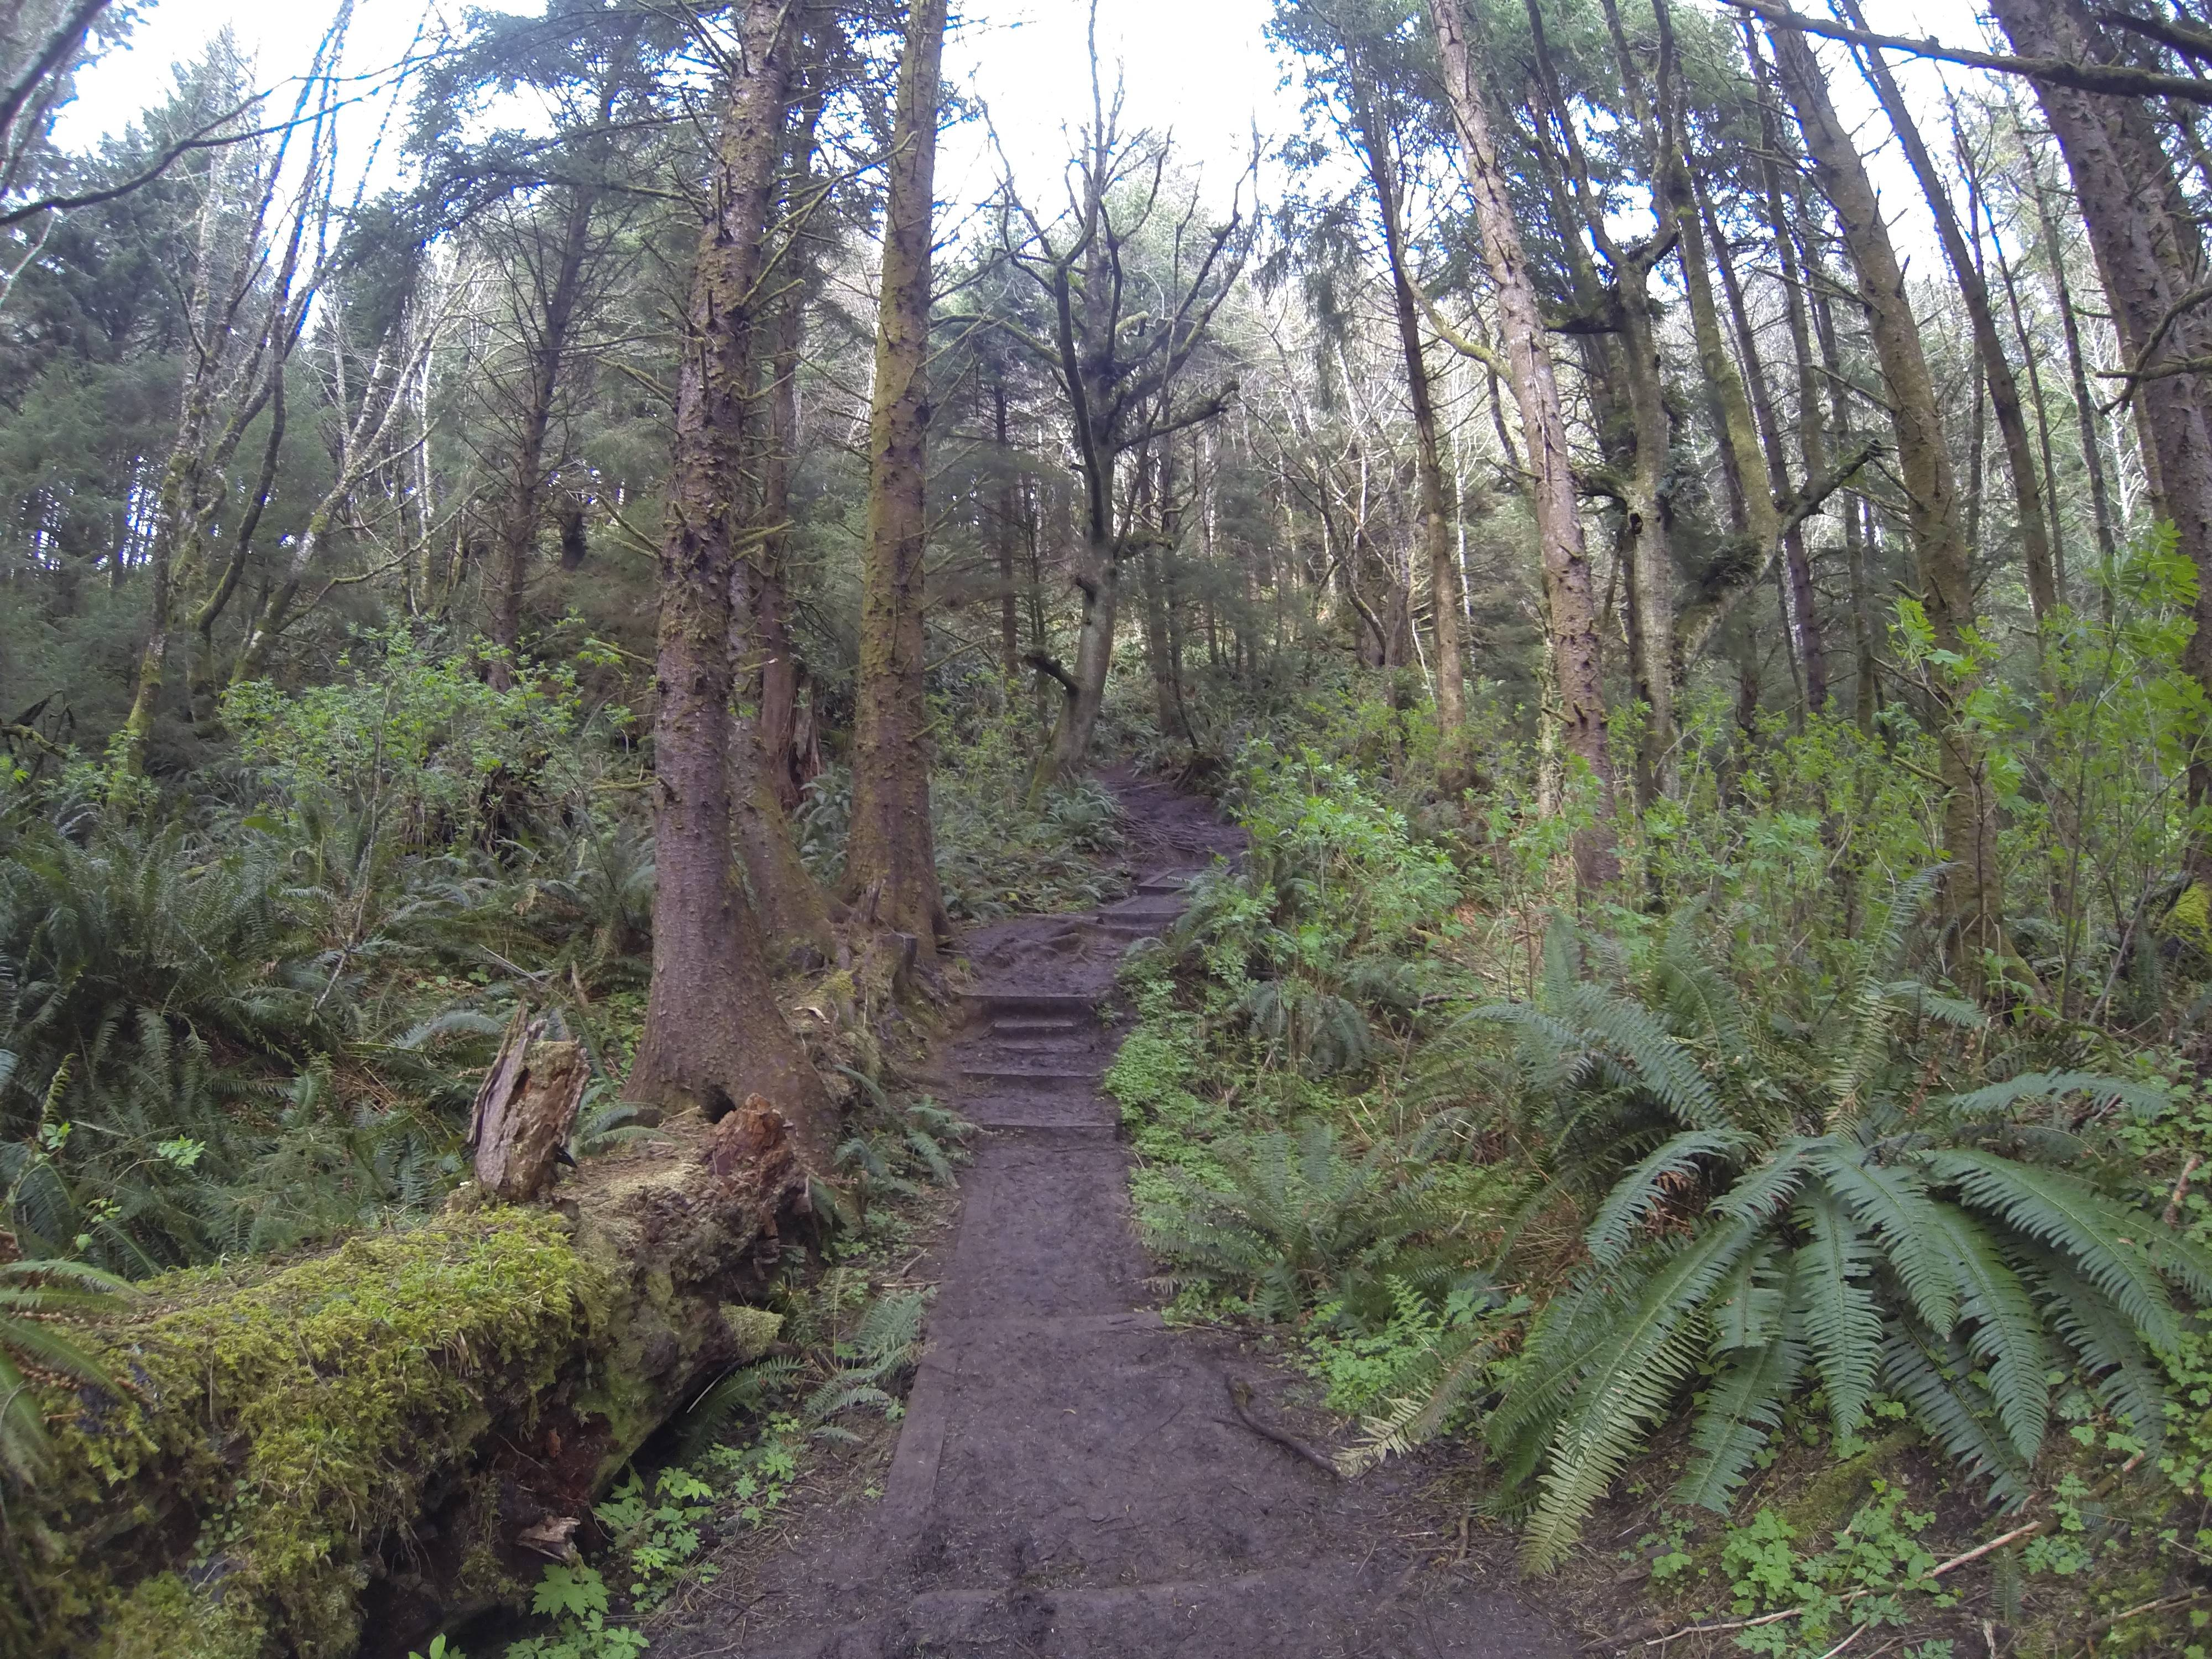 Photo 1: Ecola State Park